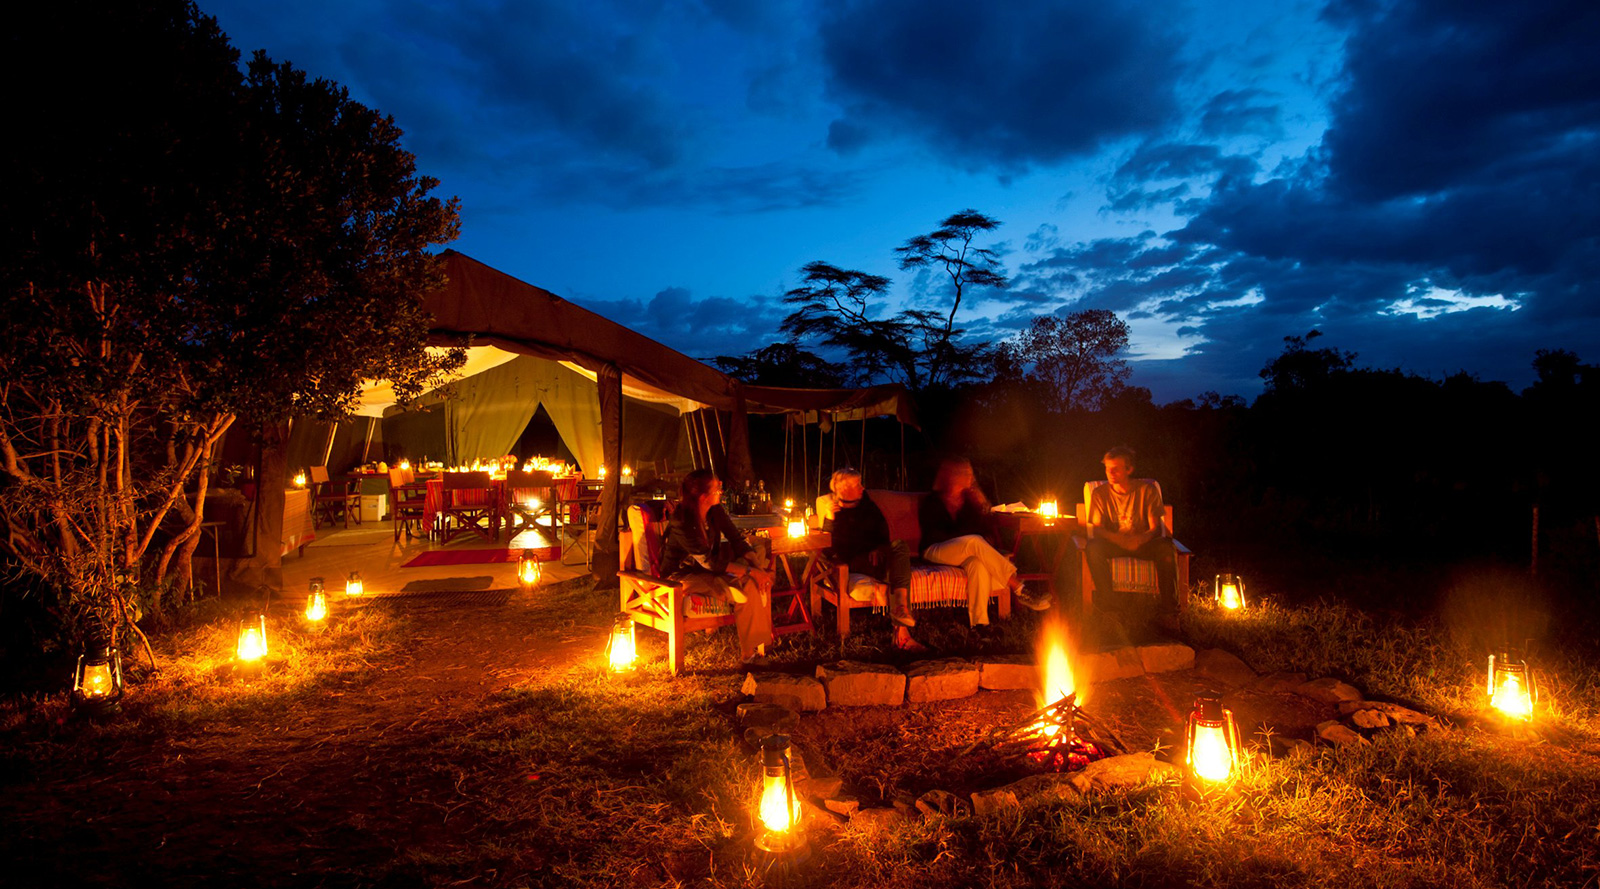 © Ol Pejeta Bush Camp | Ol Pejeta Bush Camp, Kenya